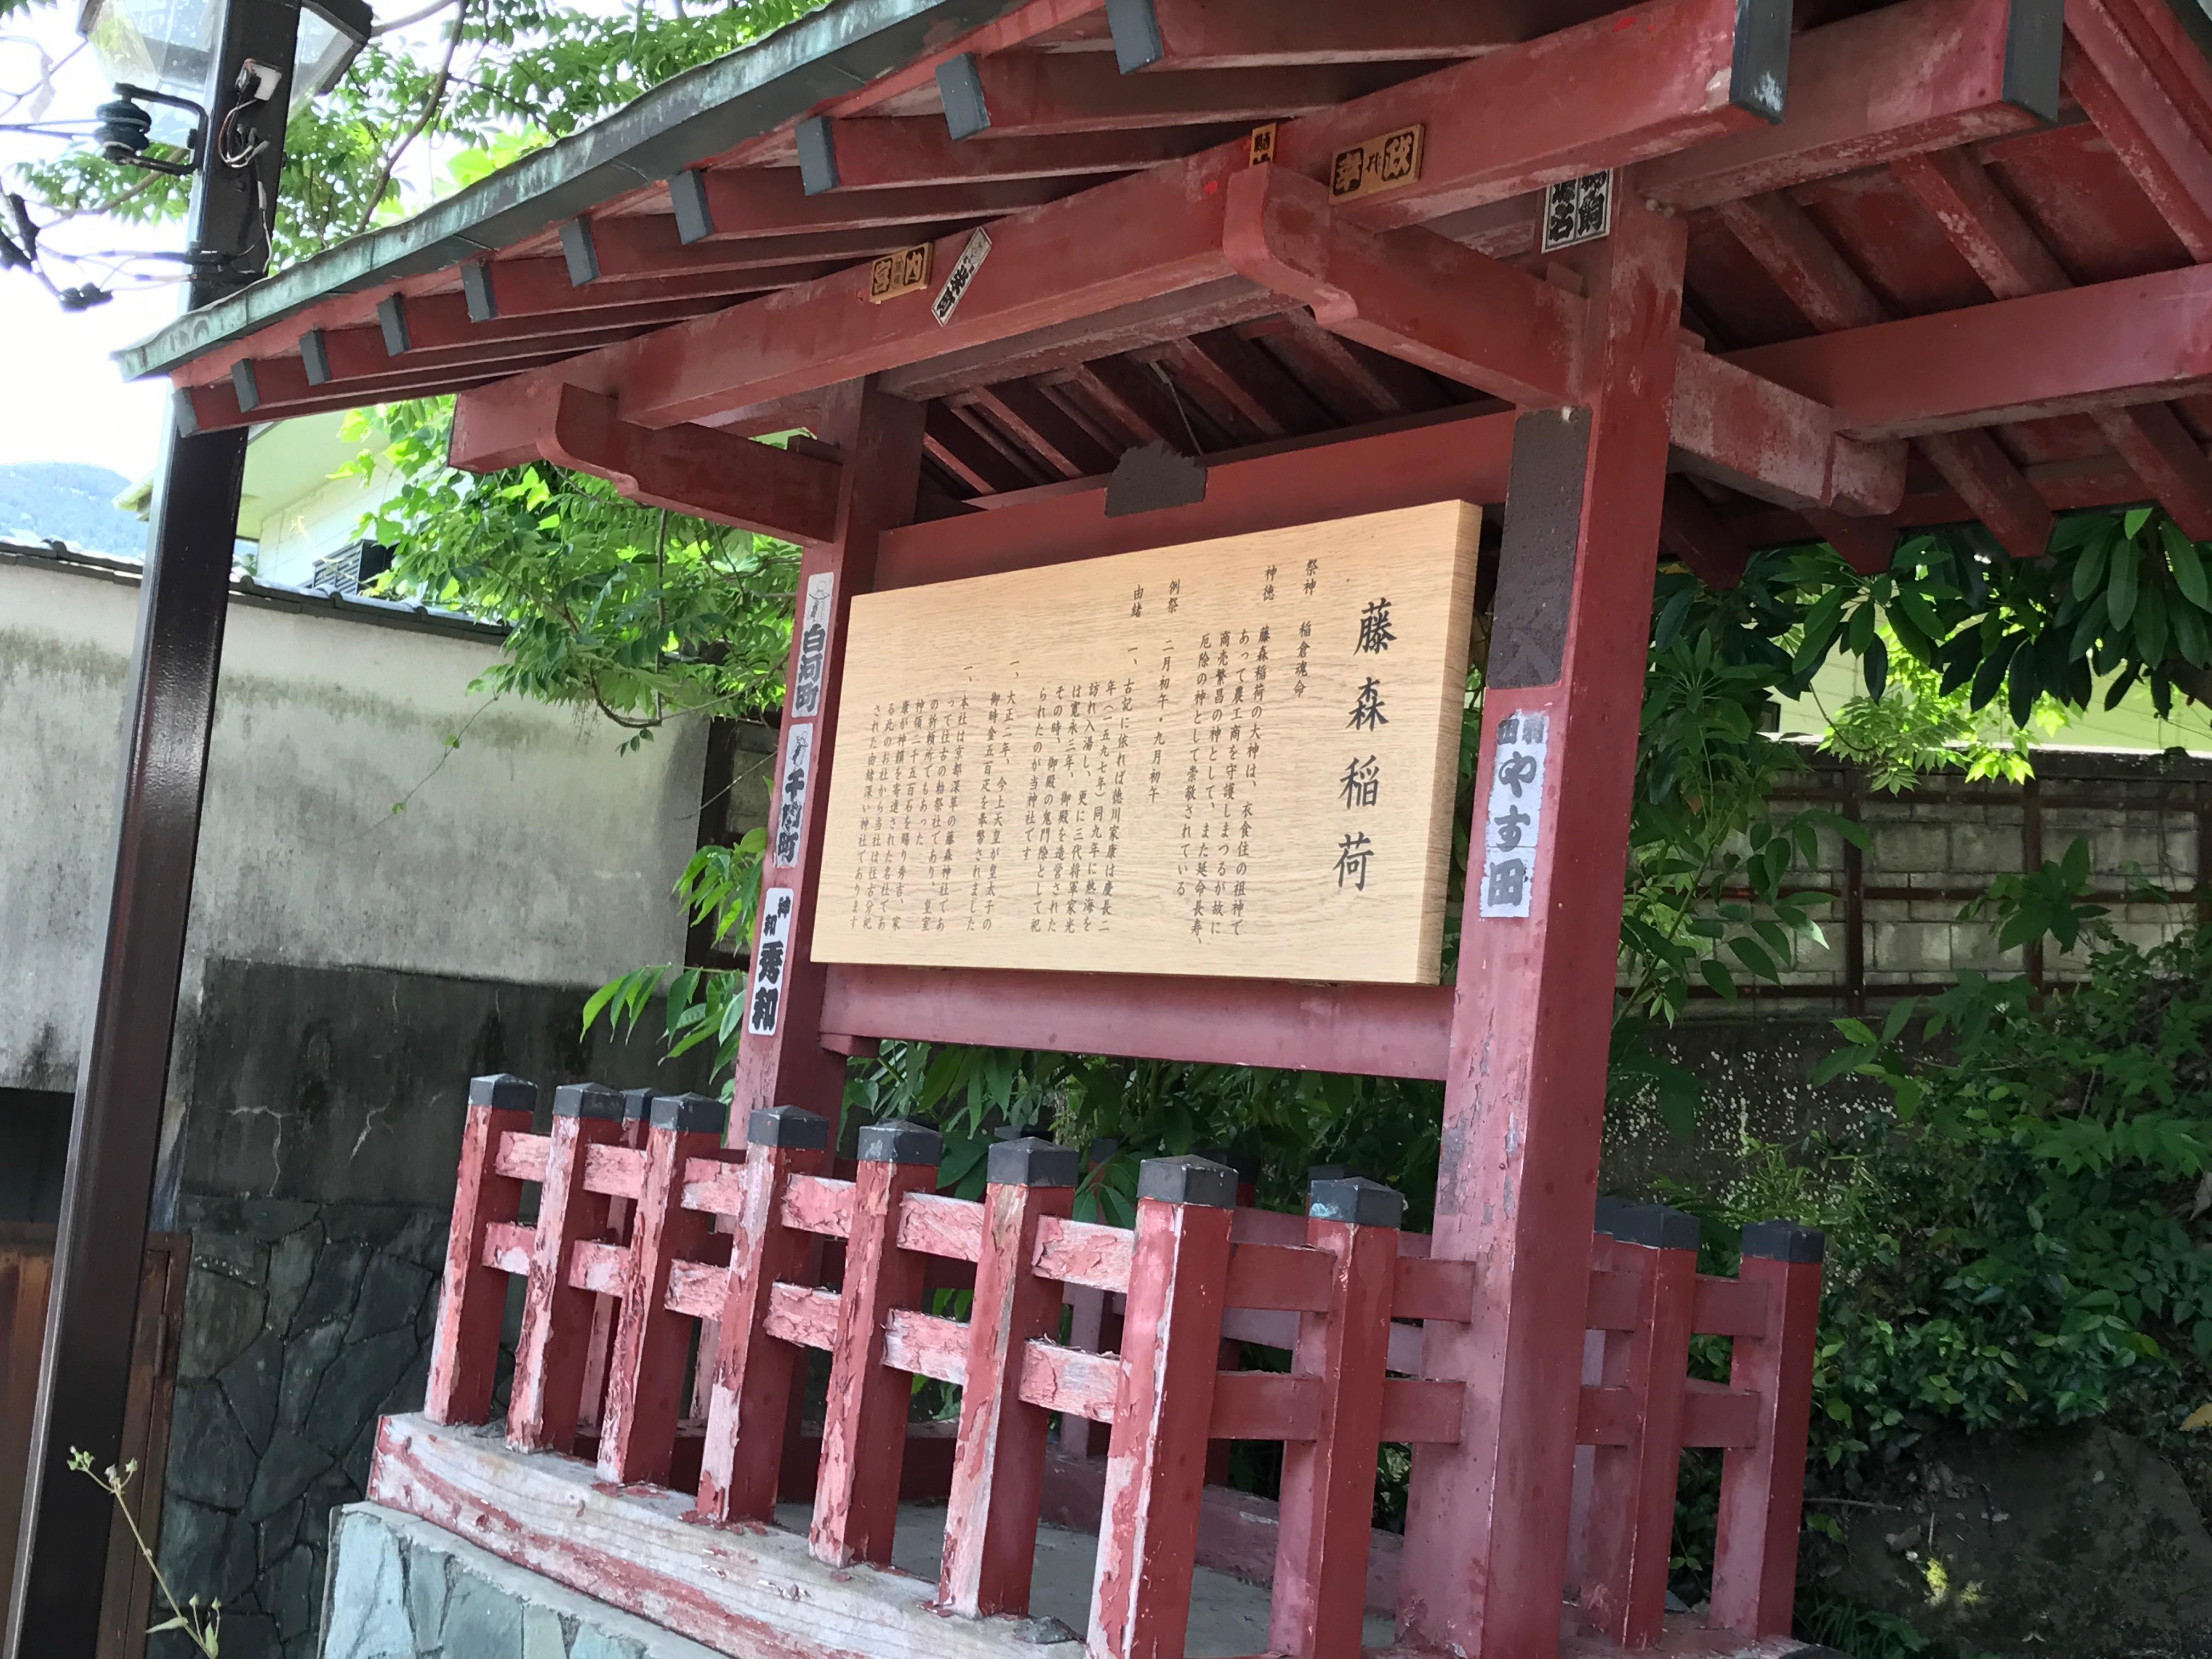 藤森稲荷神社の歴史